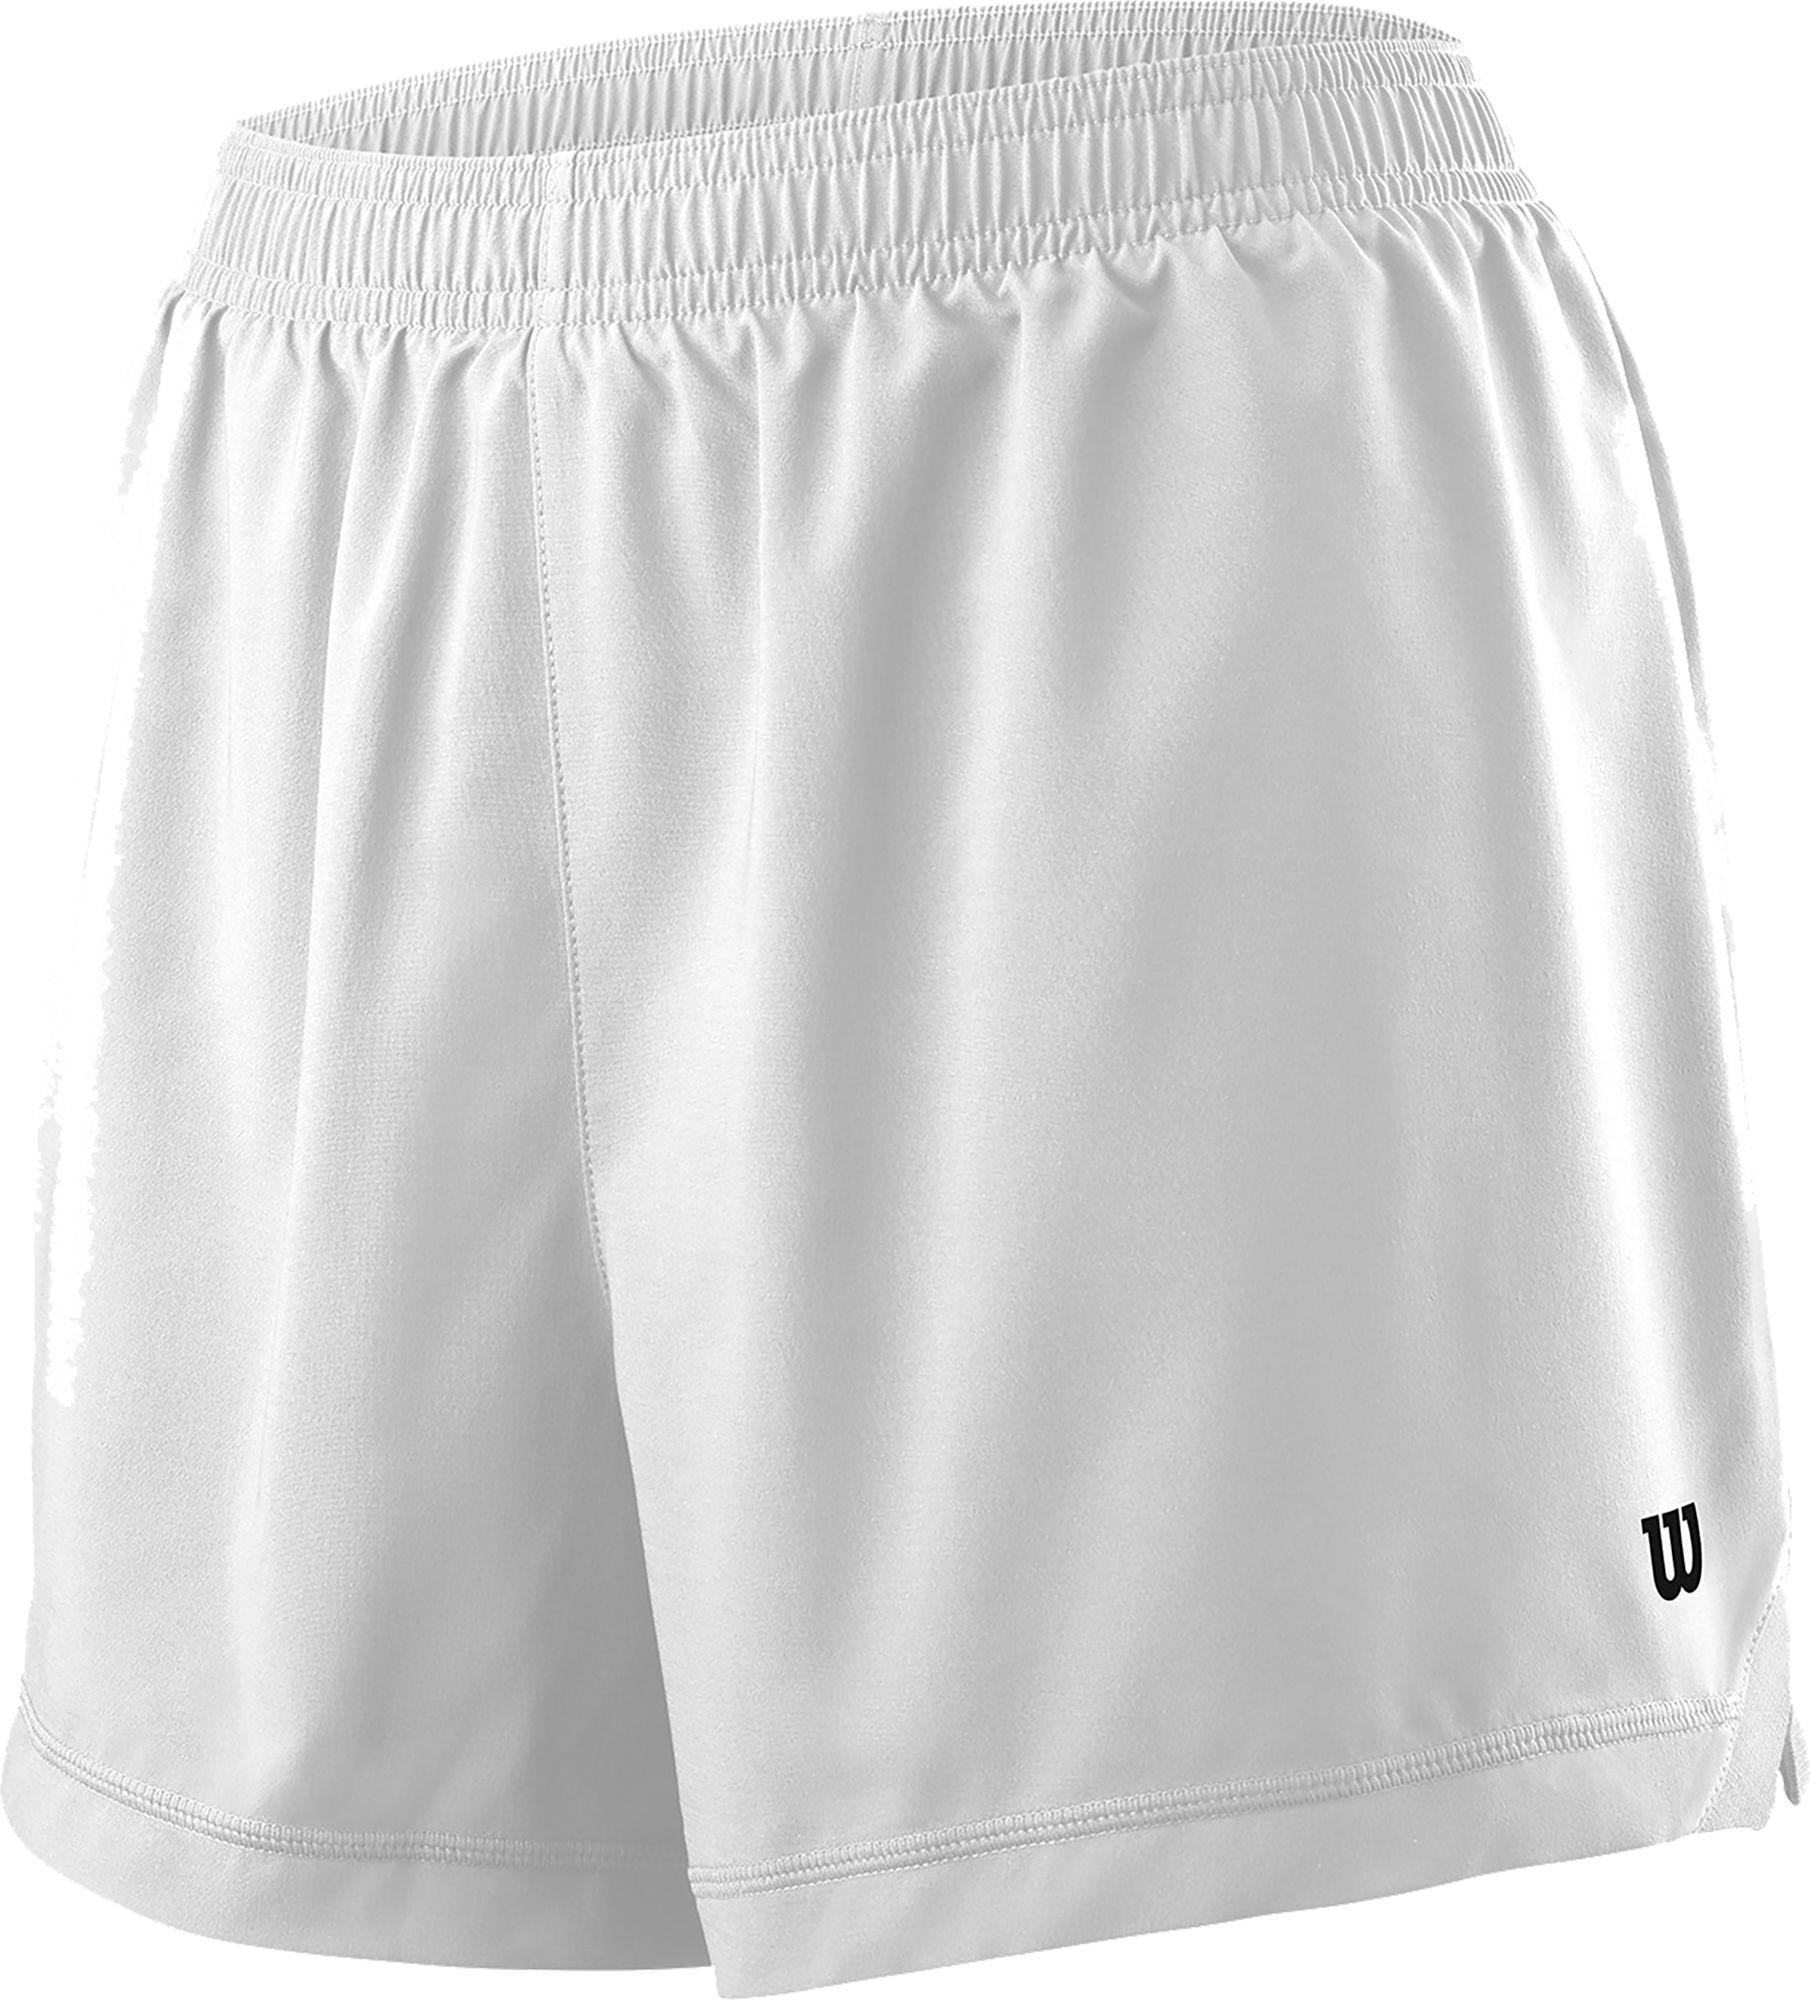 Wilson Women's Team 3.5'' Tennis Shorts, Small, White